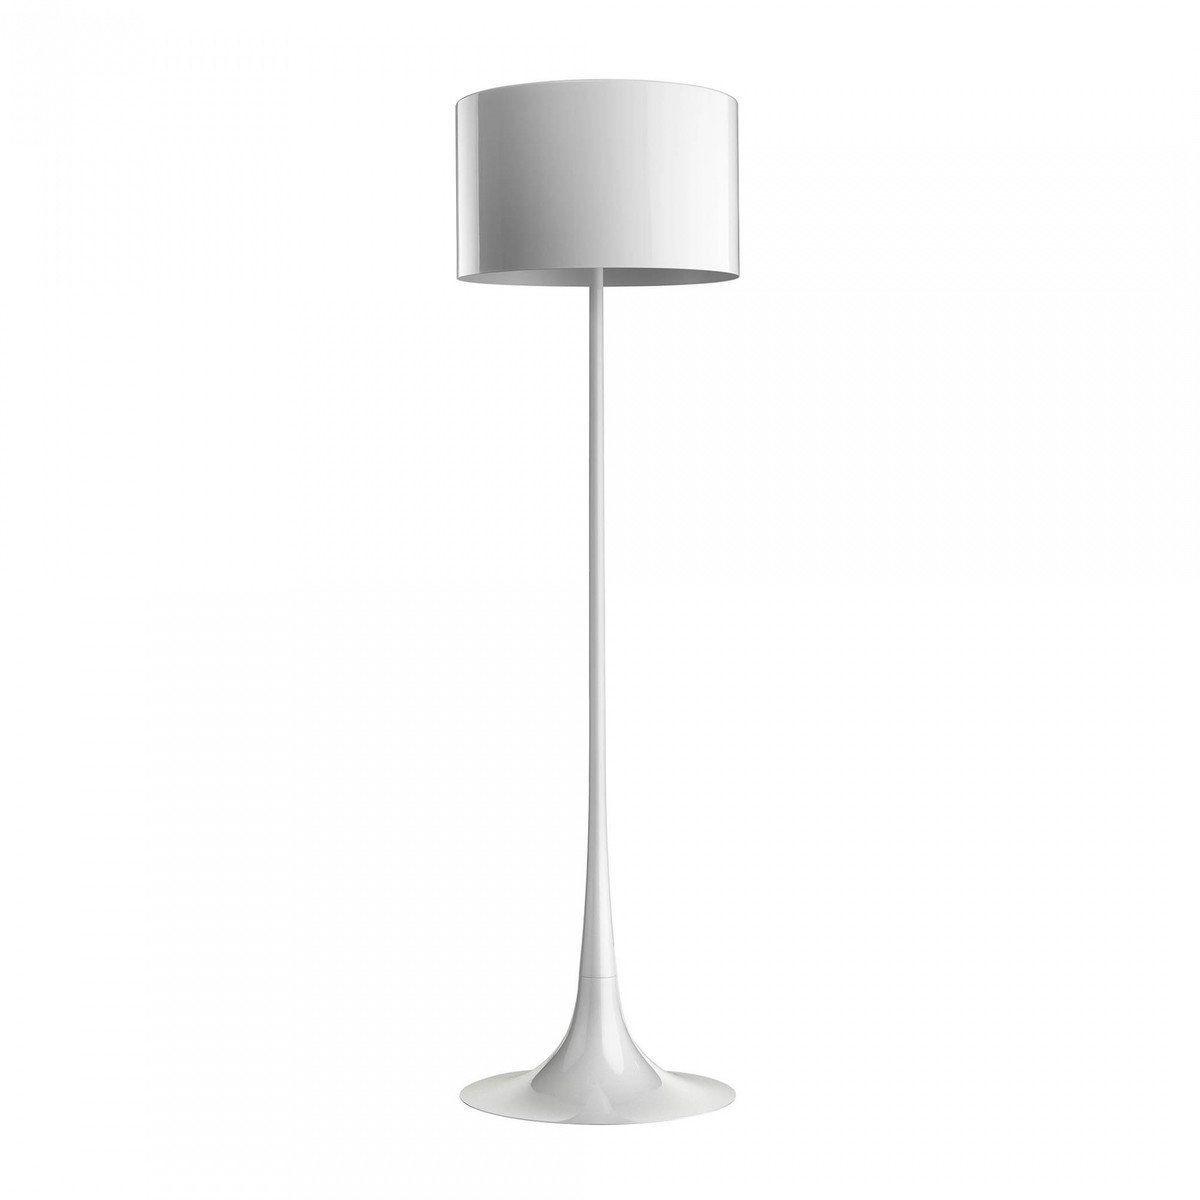 Spun Light F ECO Floor Lamp | Flos | AmbienteDirect.com for Flos Spun Table Lamp  34eri